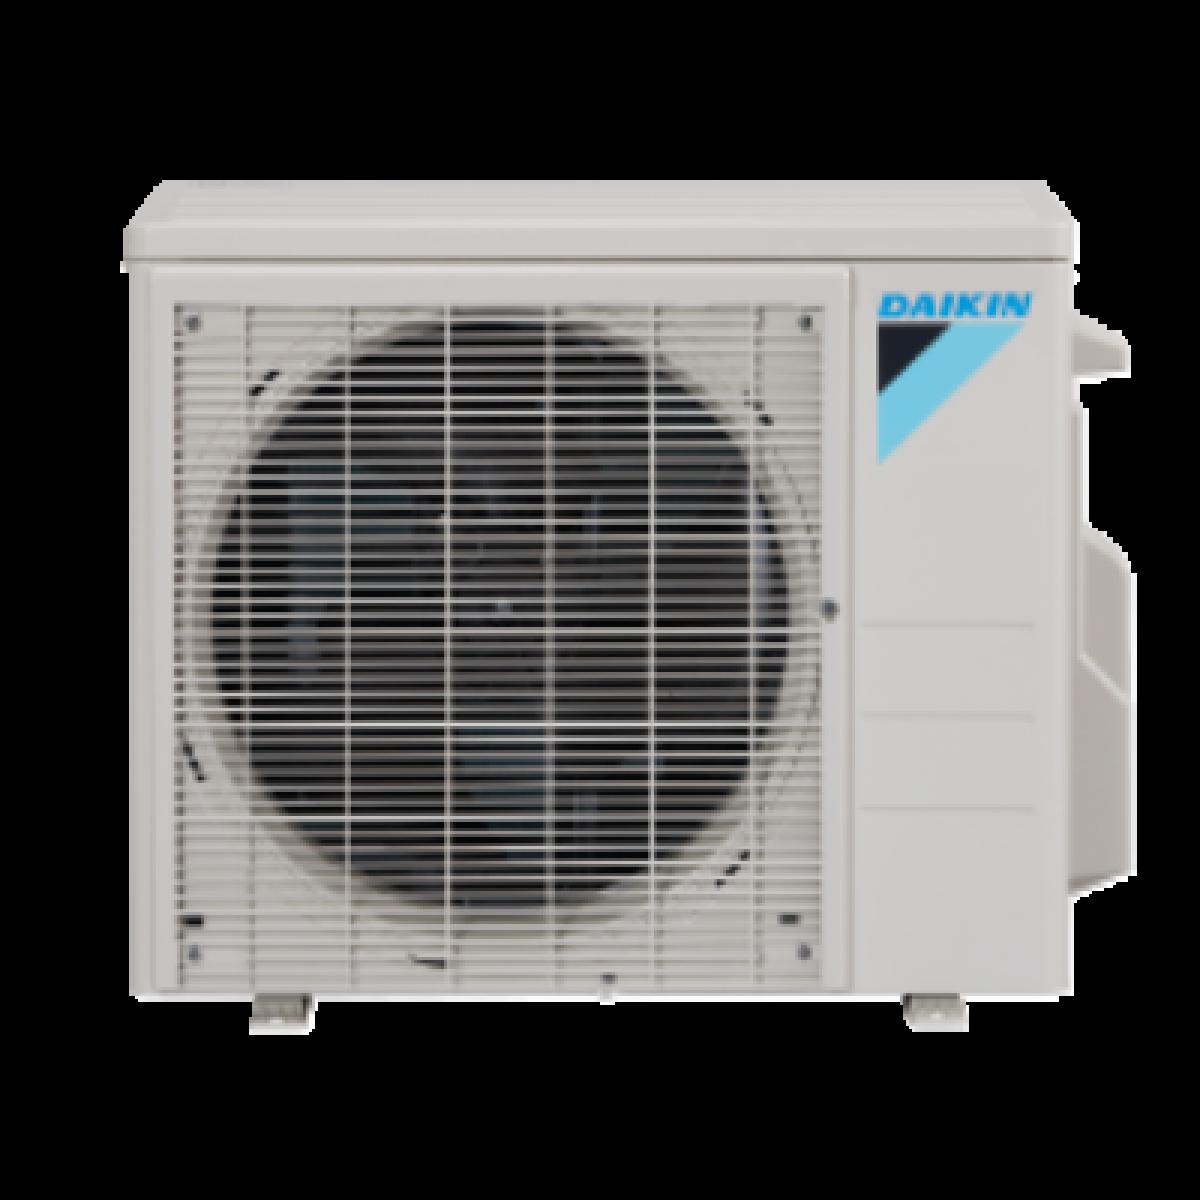 Daikin 2 Zone 18k Btu Heat Pump System Multi Zone